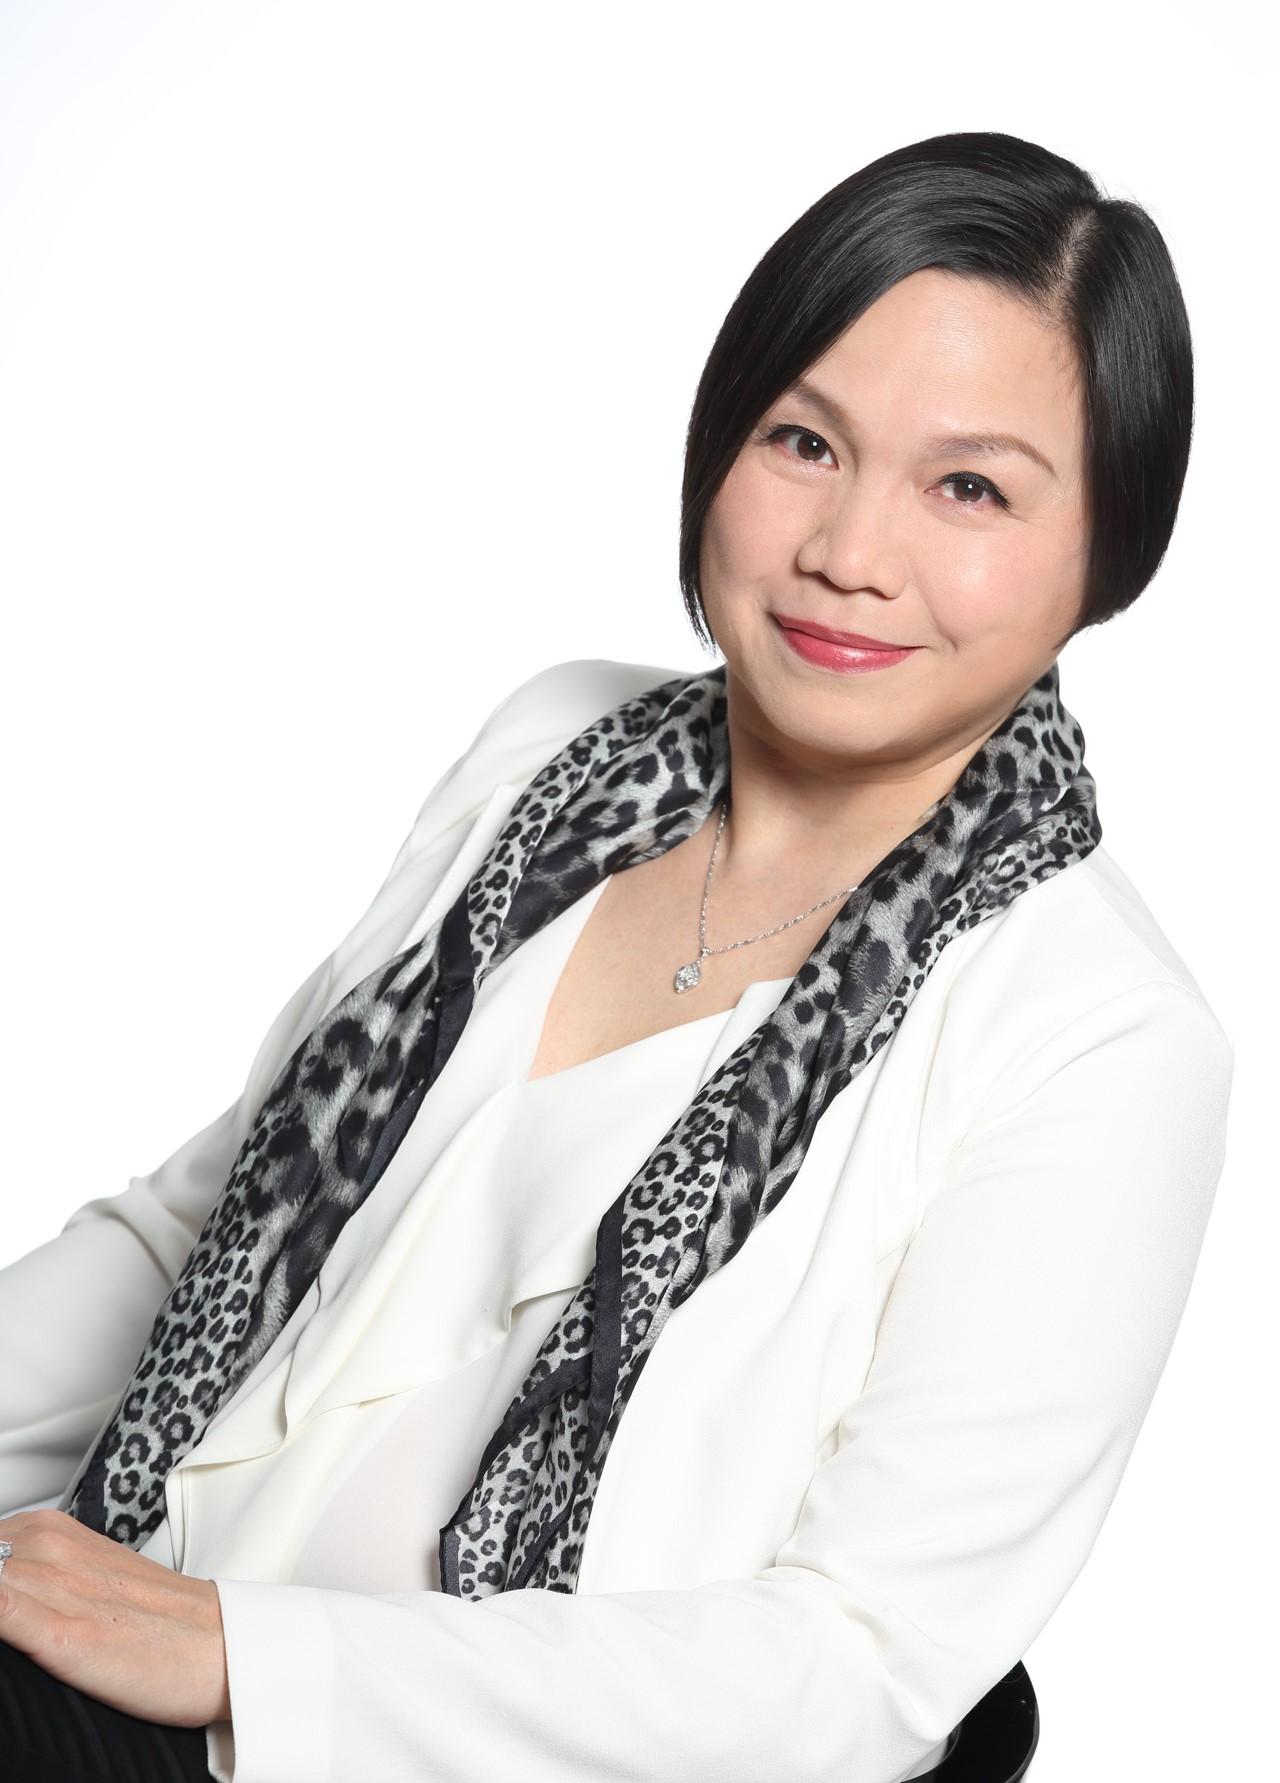 Profile image 2